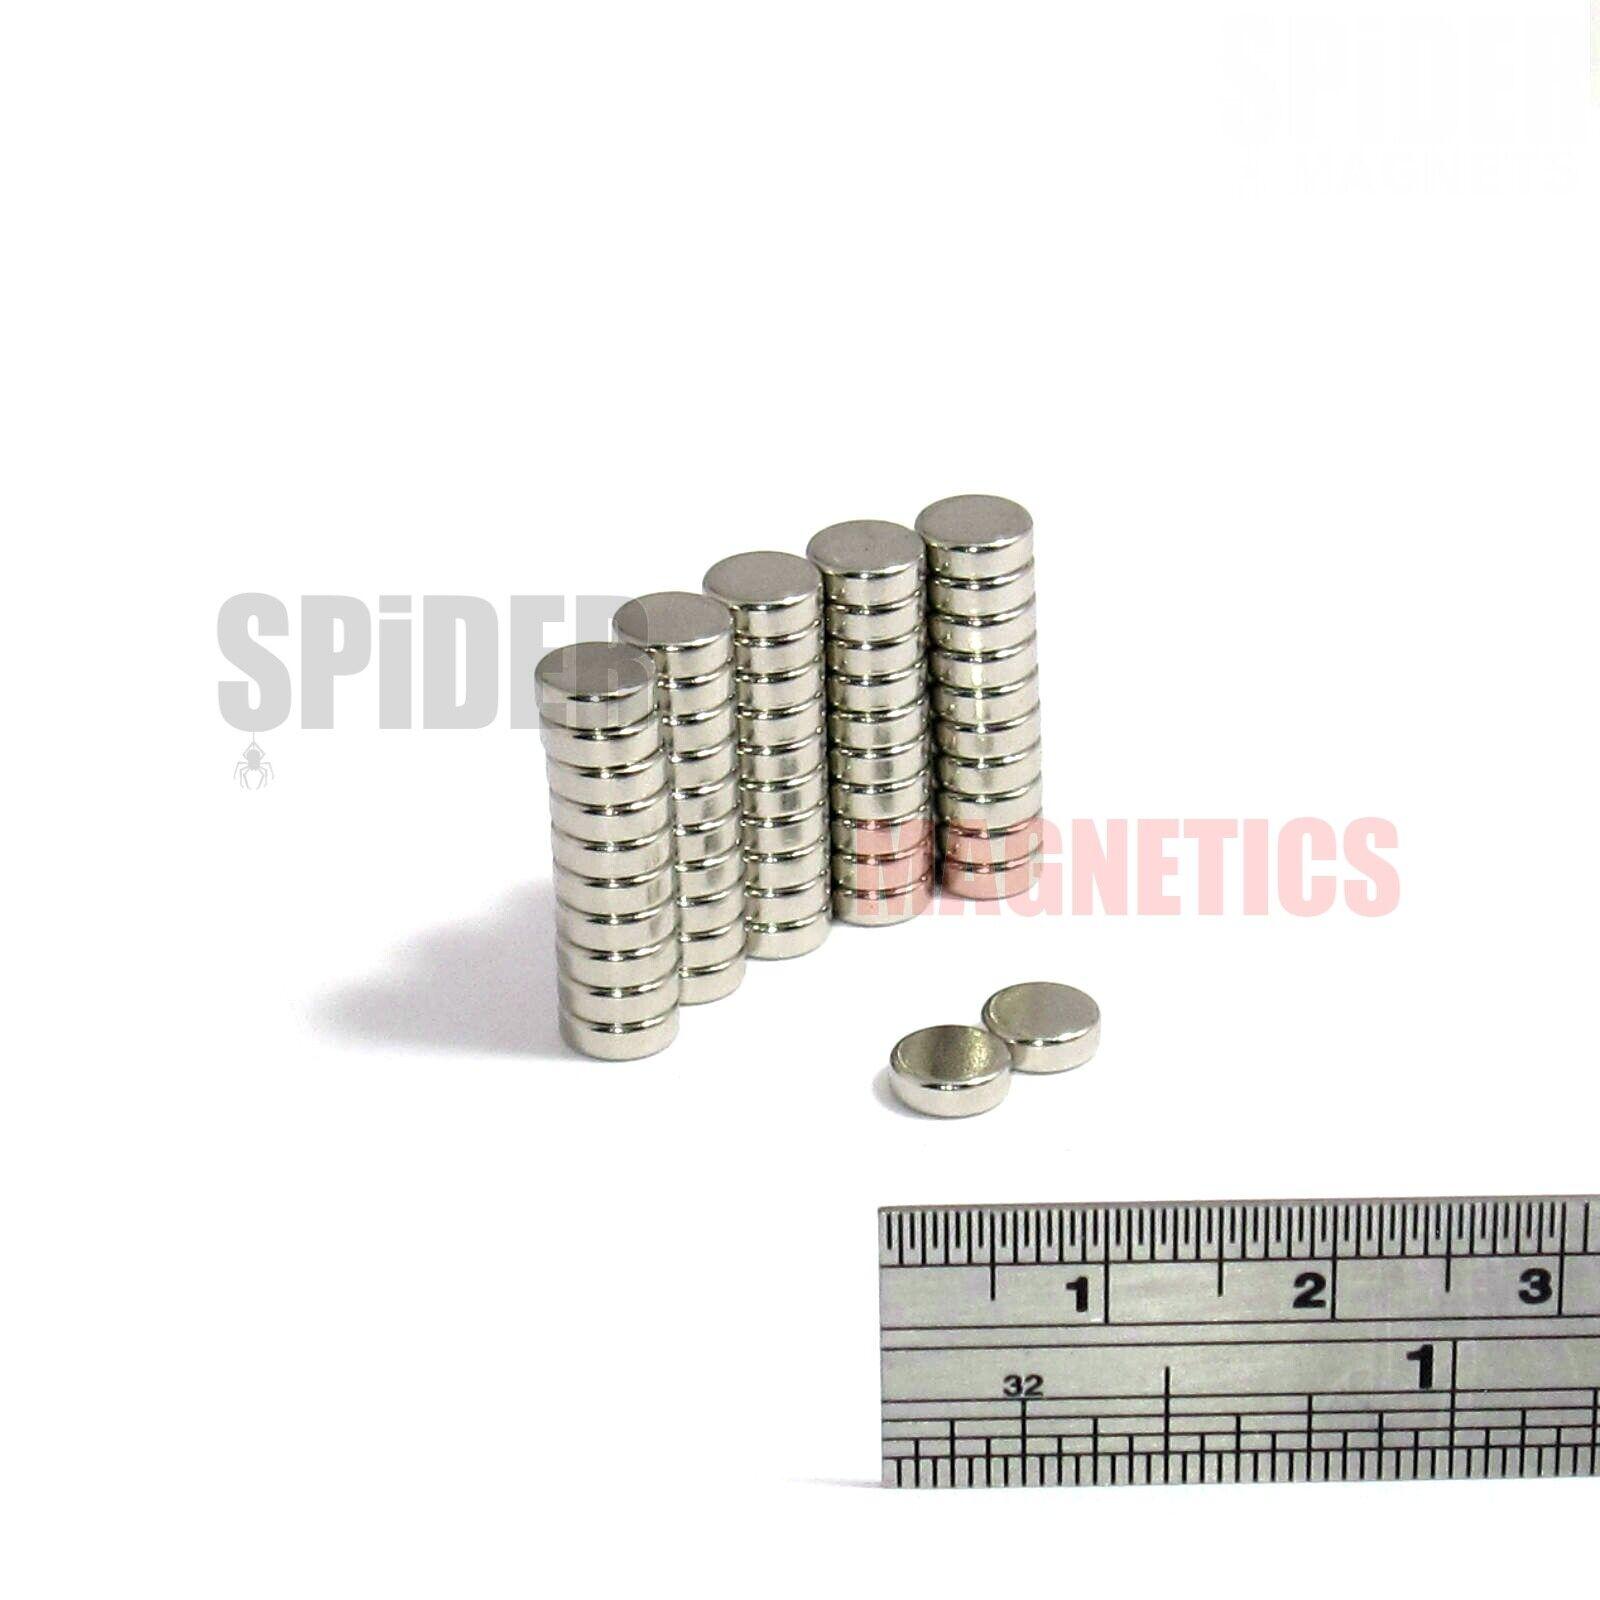 50 Magnets 6x2 mm Neodymium Disc small round magnet 6mm dia